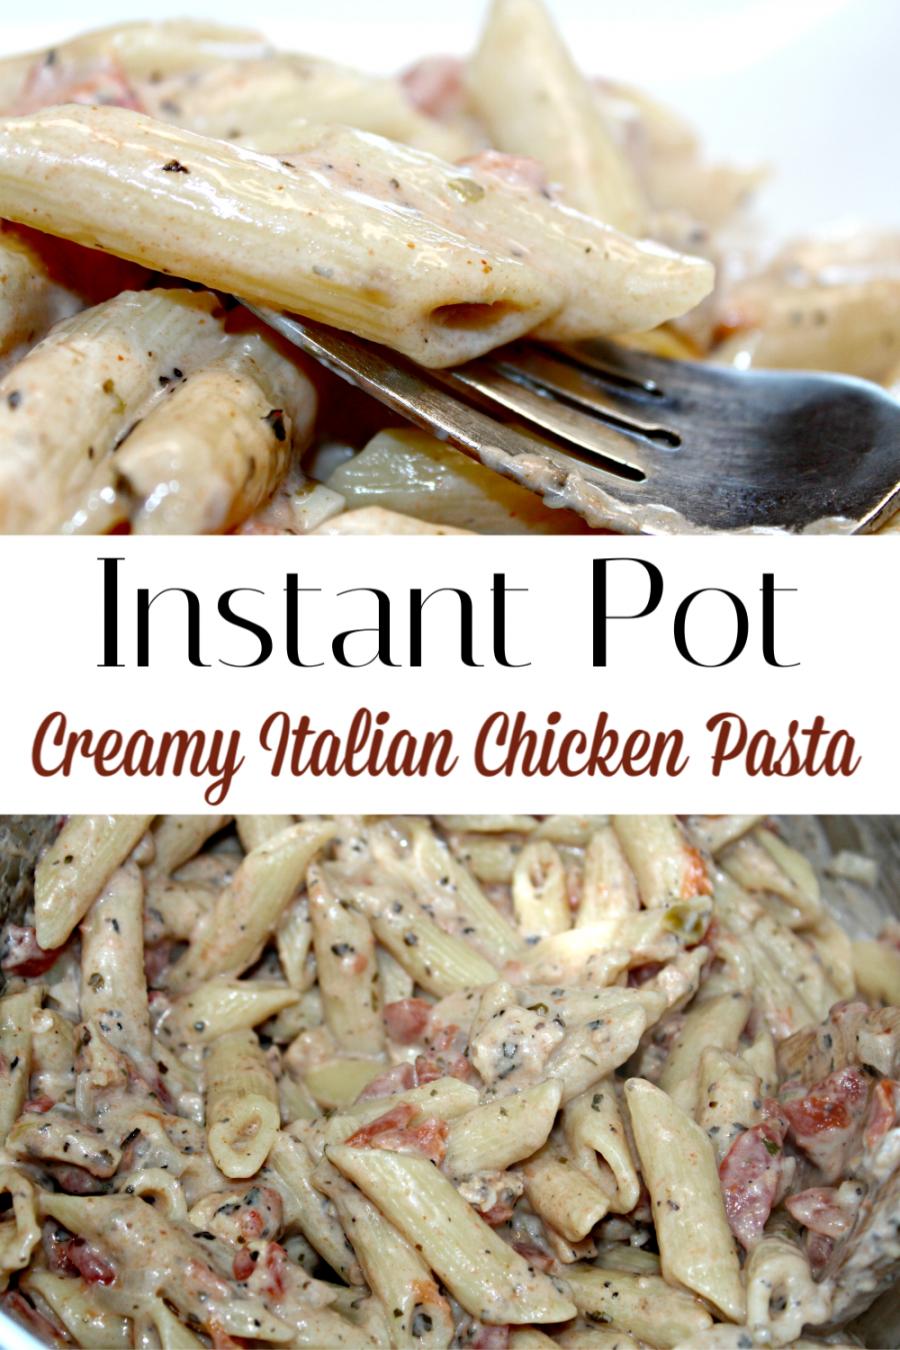 Creamy Italian Chicken Pasta Instant Pot Recipe (Pressure Cooker images